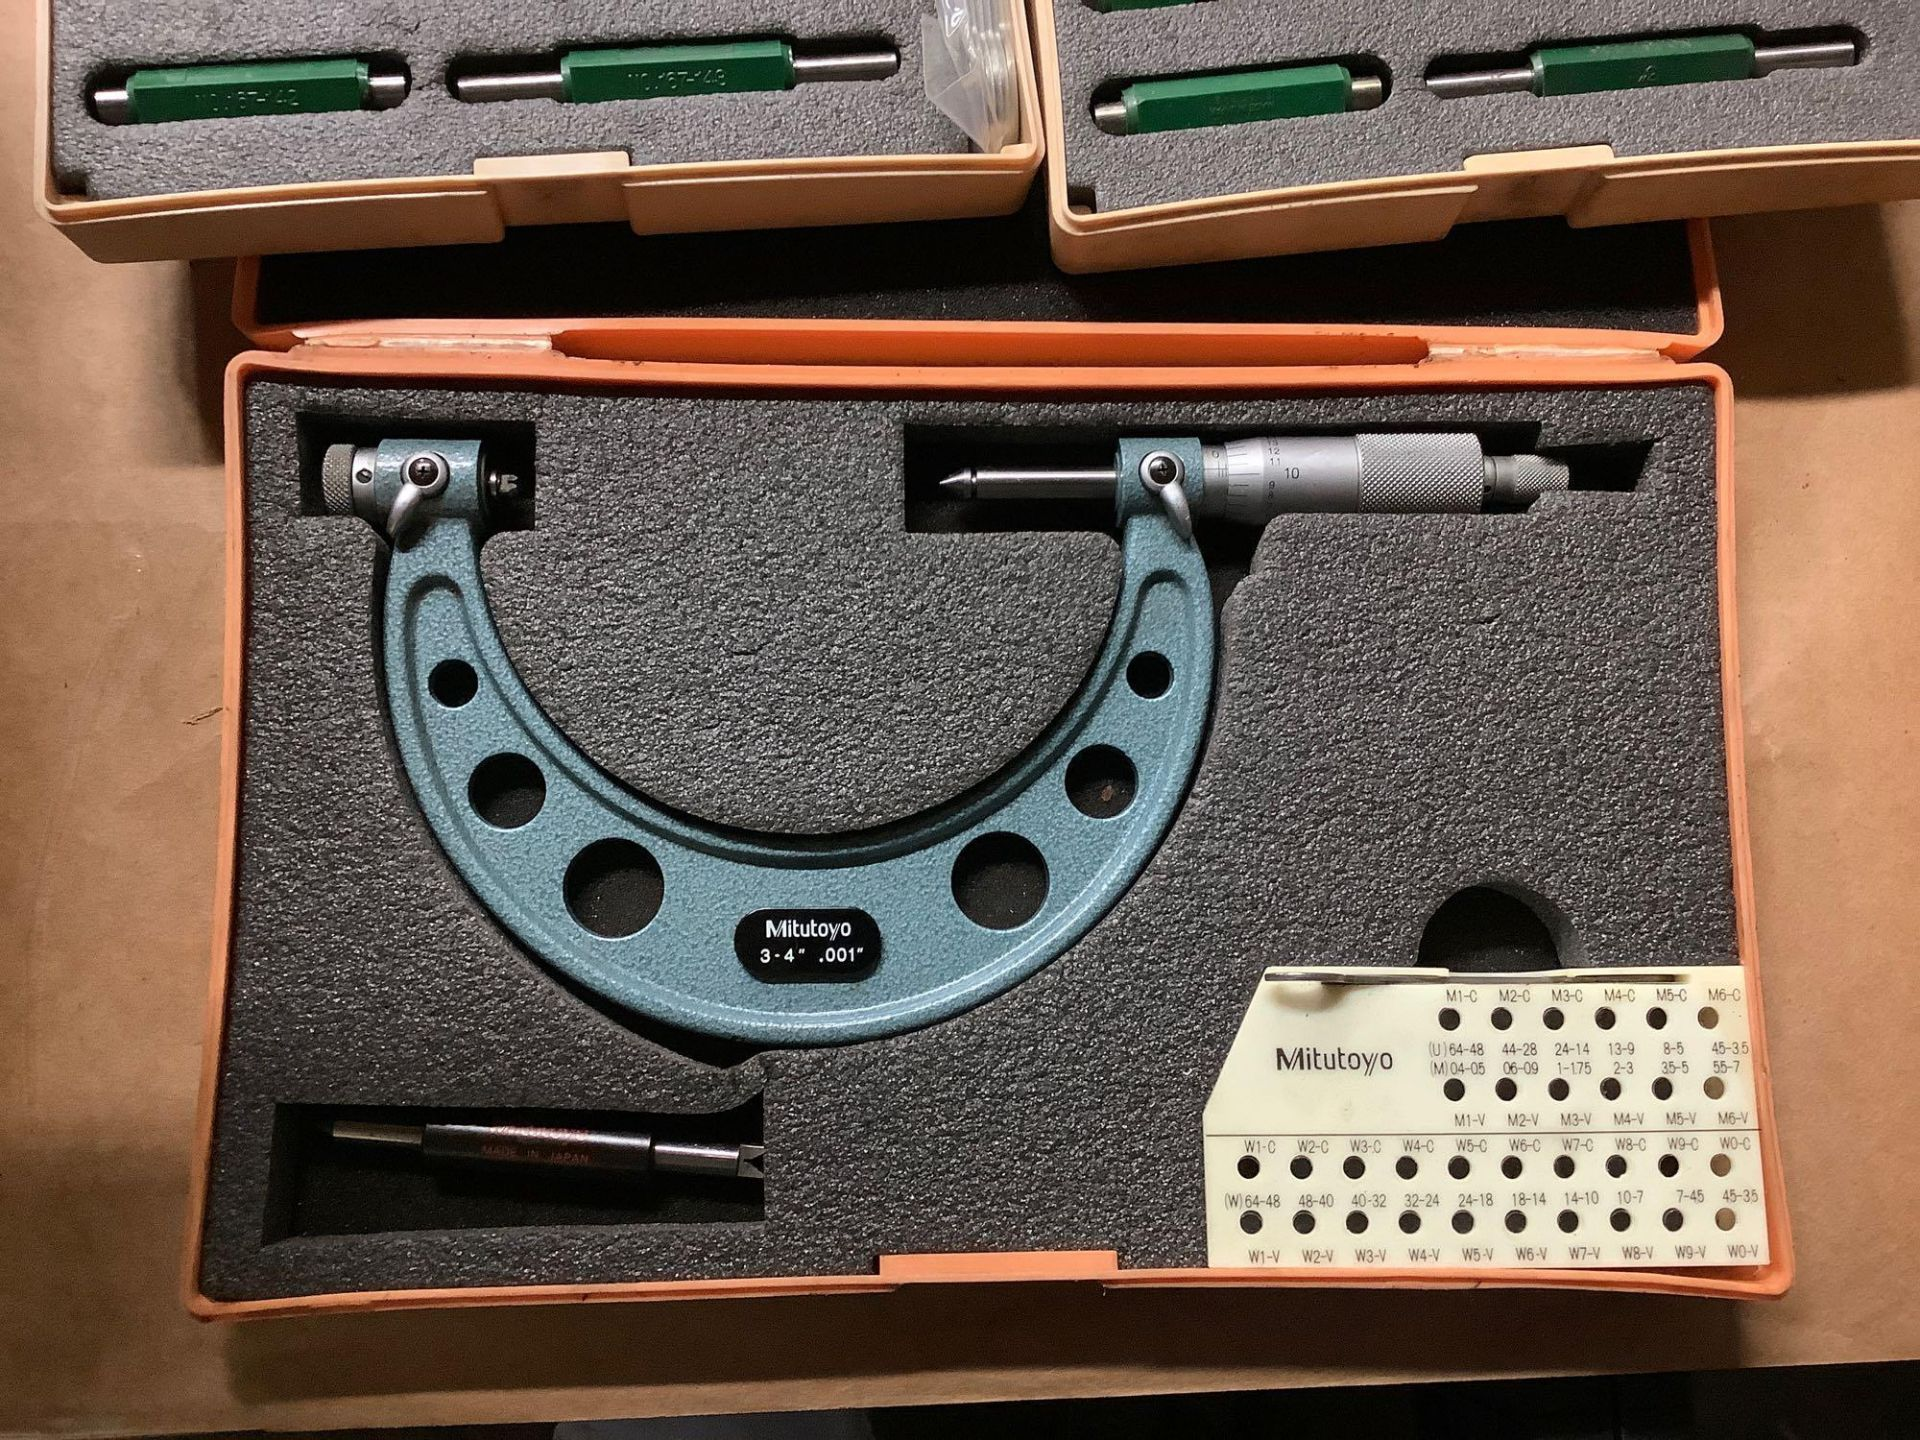 Lot: Mitutoyo Micrometers and Micrometer Bars - Image 4 of 5